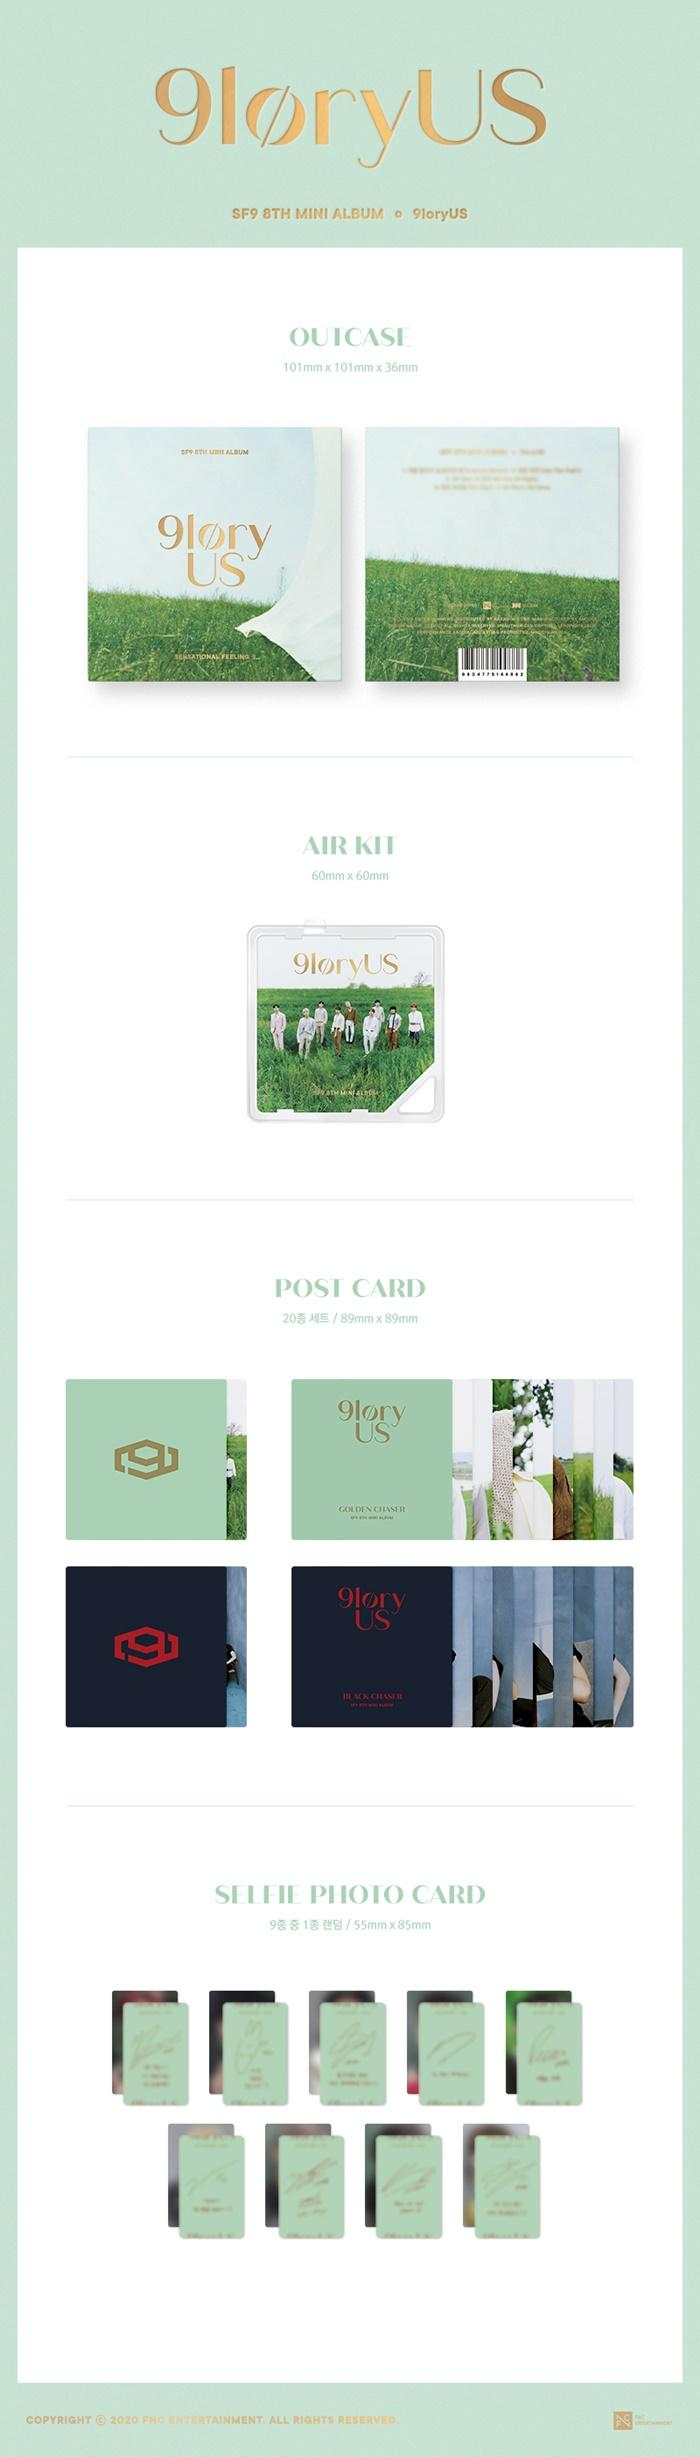 SF9 - 8th Mini [9loryUS] (Kit Album)